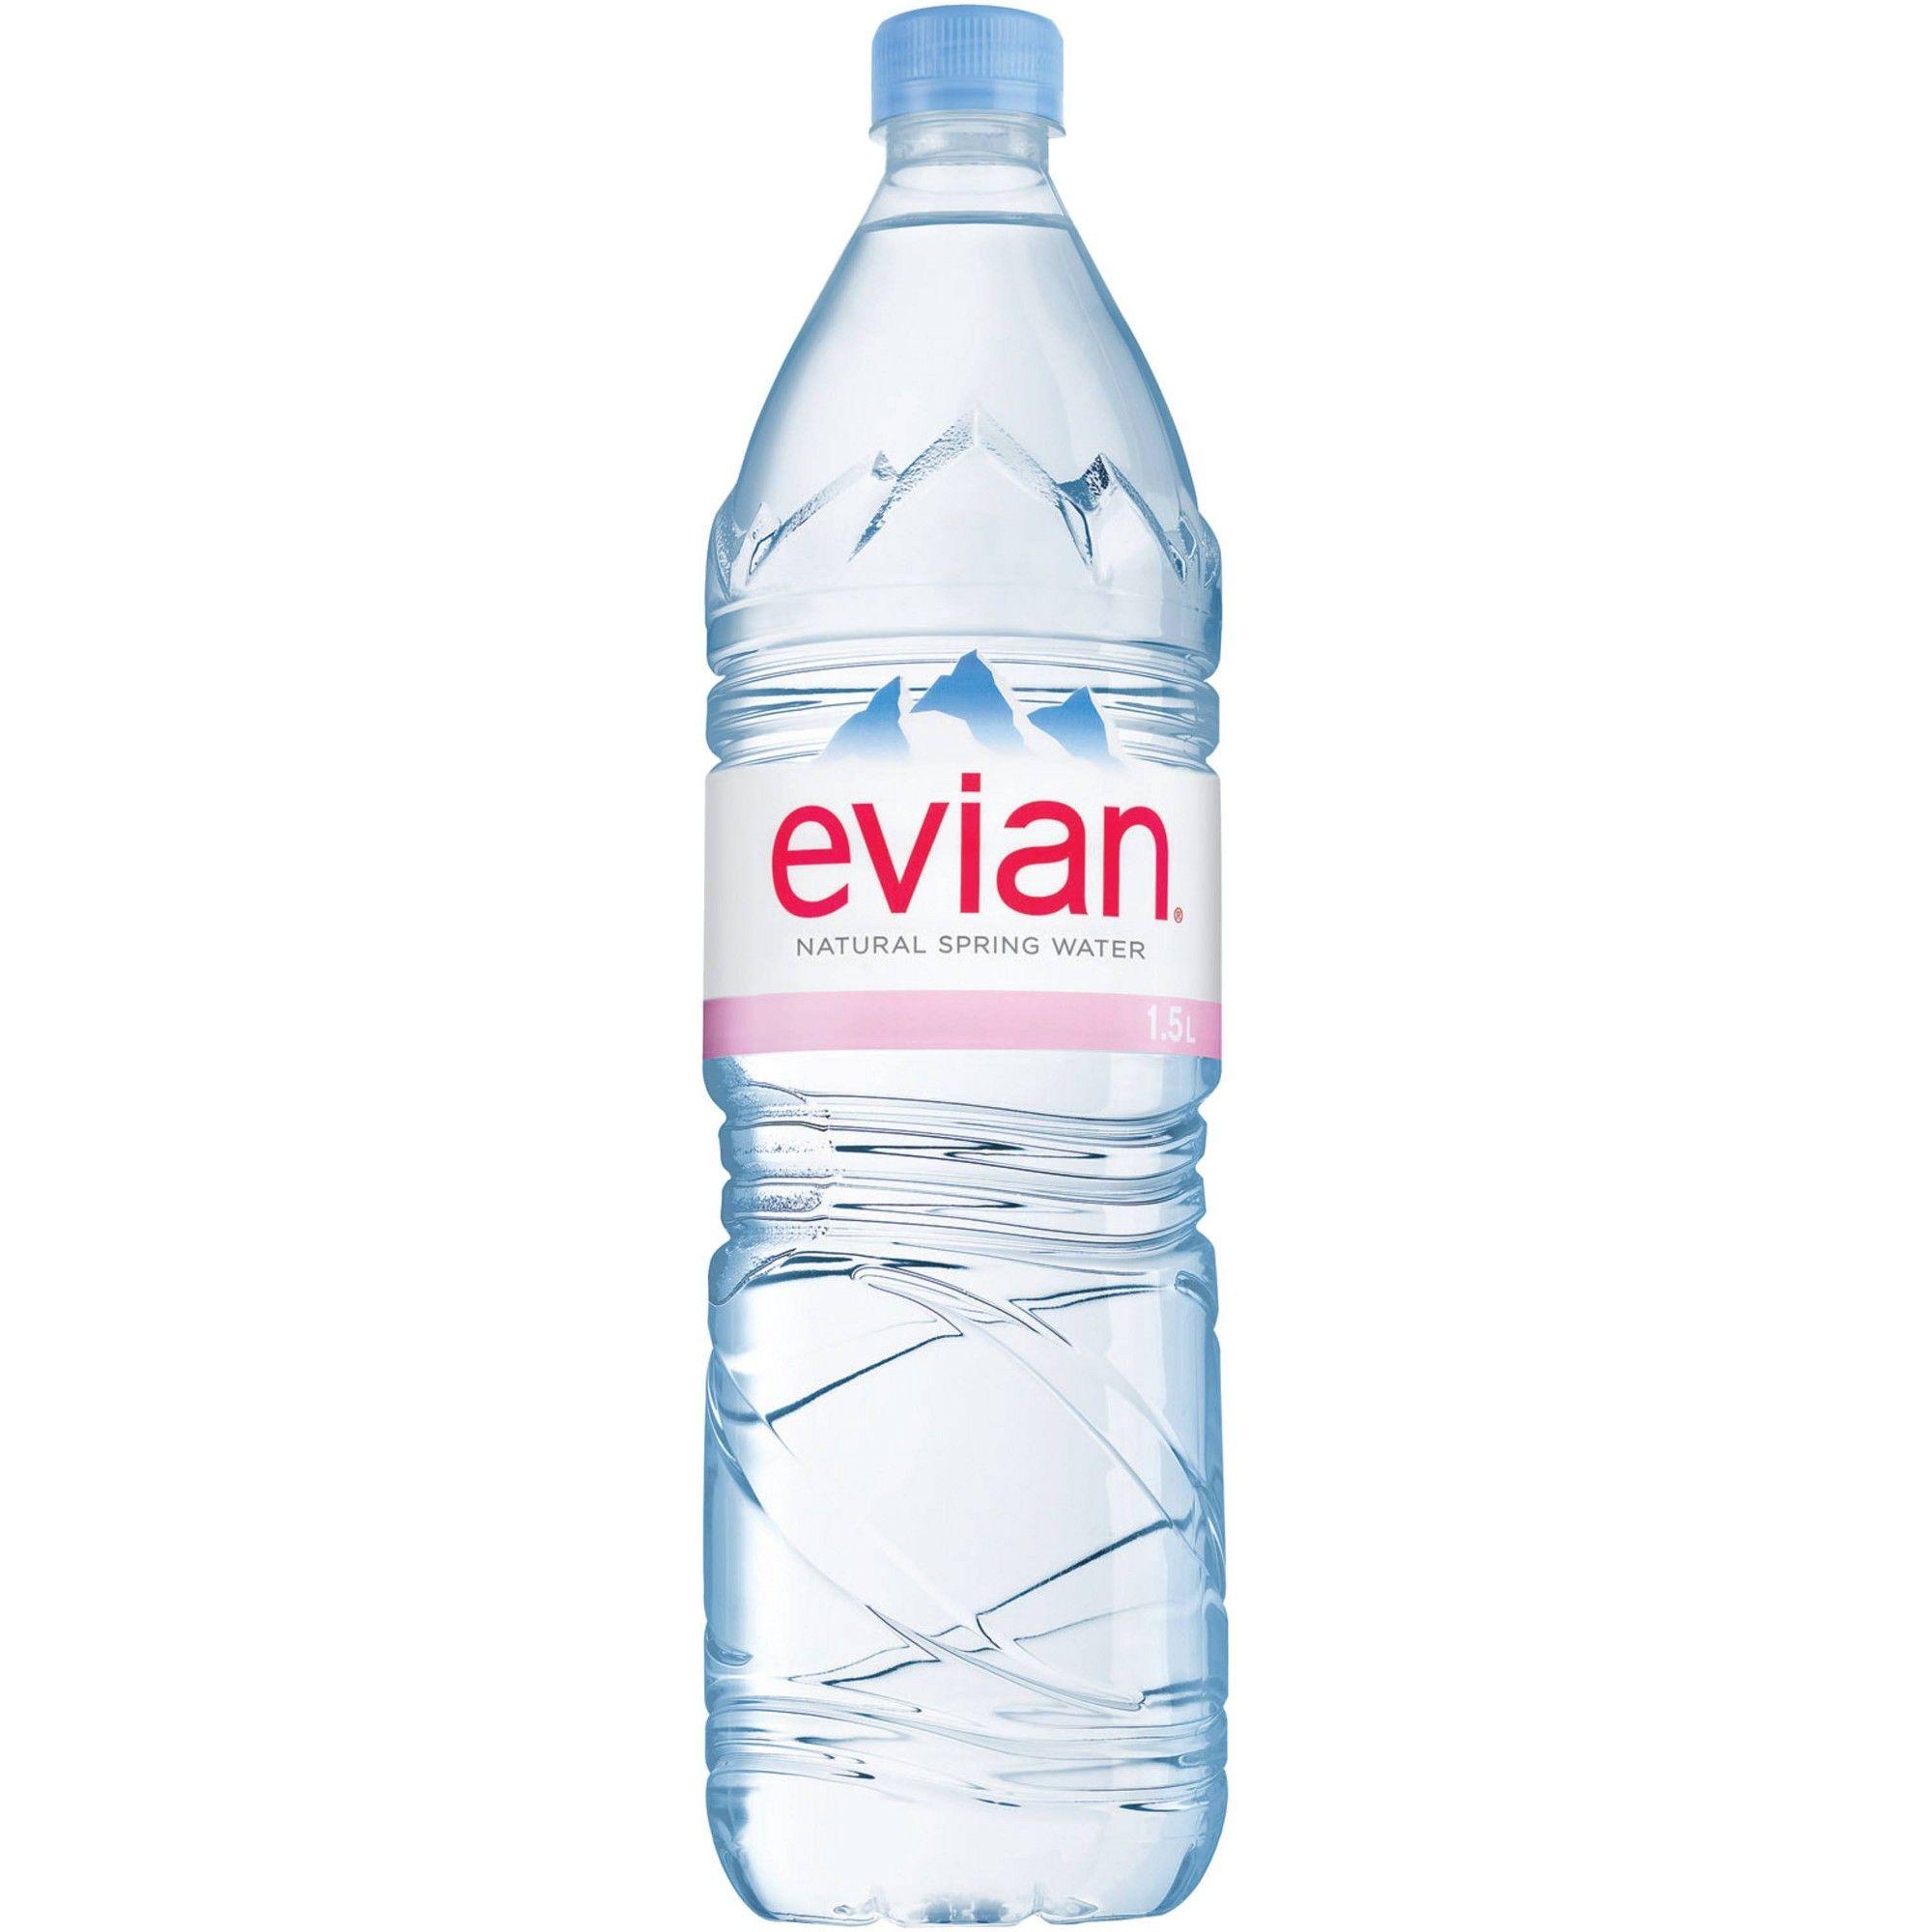 Evian Natural Spring Water 1 5l Bottle In 2020 Natural Spring Water Evian Spring Water